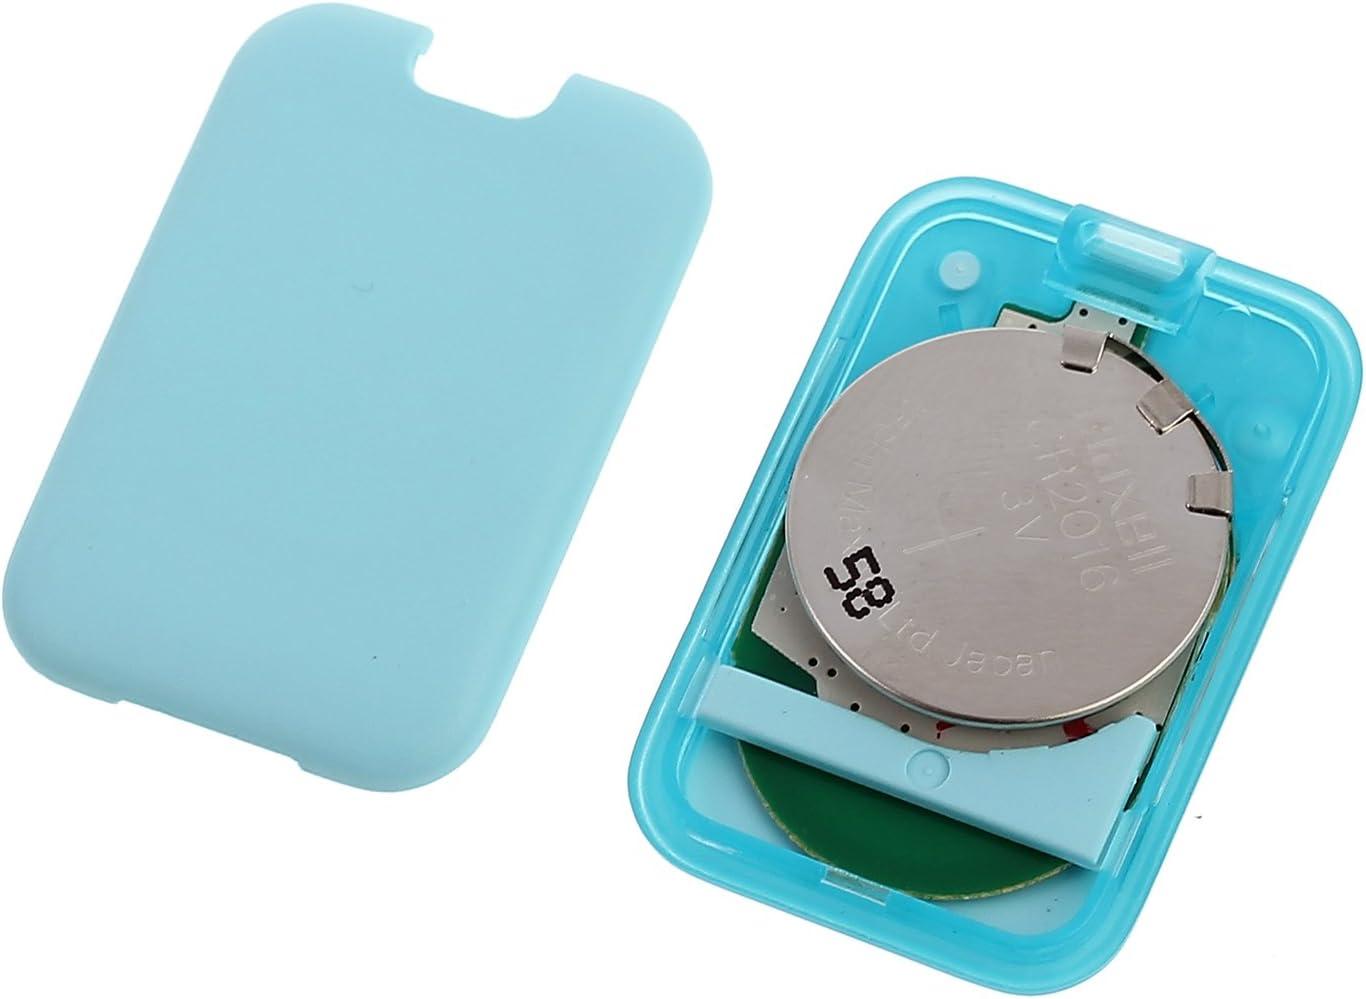 Blue Neoteck Nut 3 Smart Tag Super Mini Bluetooth Tracker Key Pet Bag Tracer Finder Anti Lost Alarm